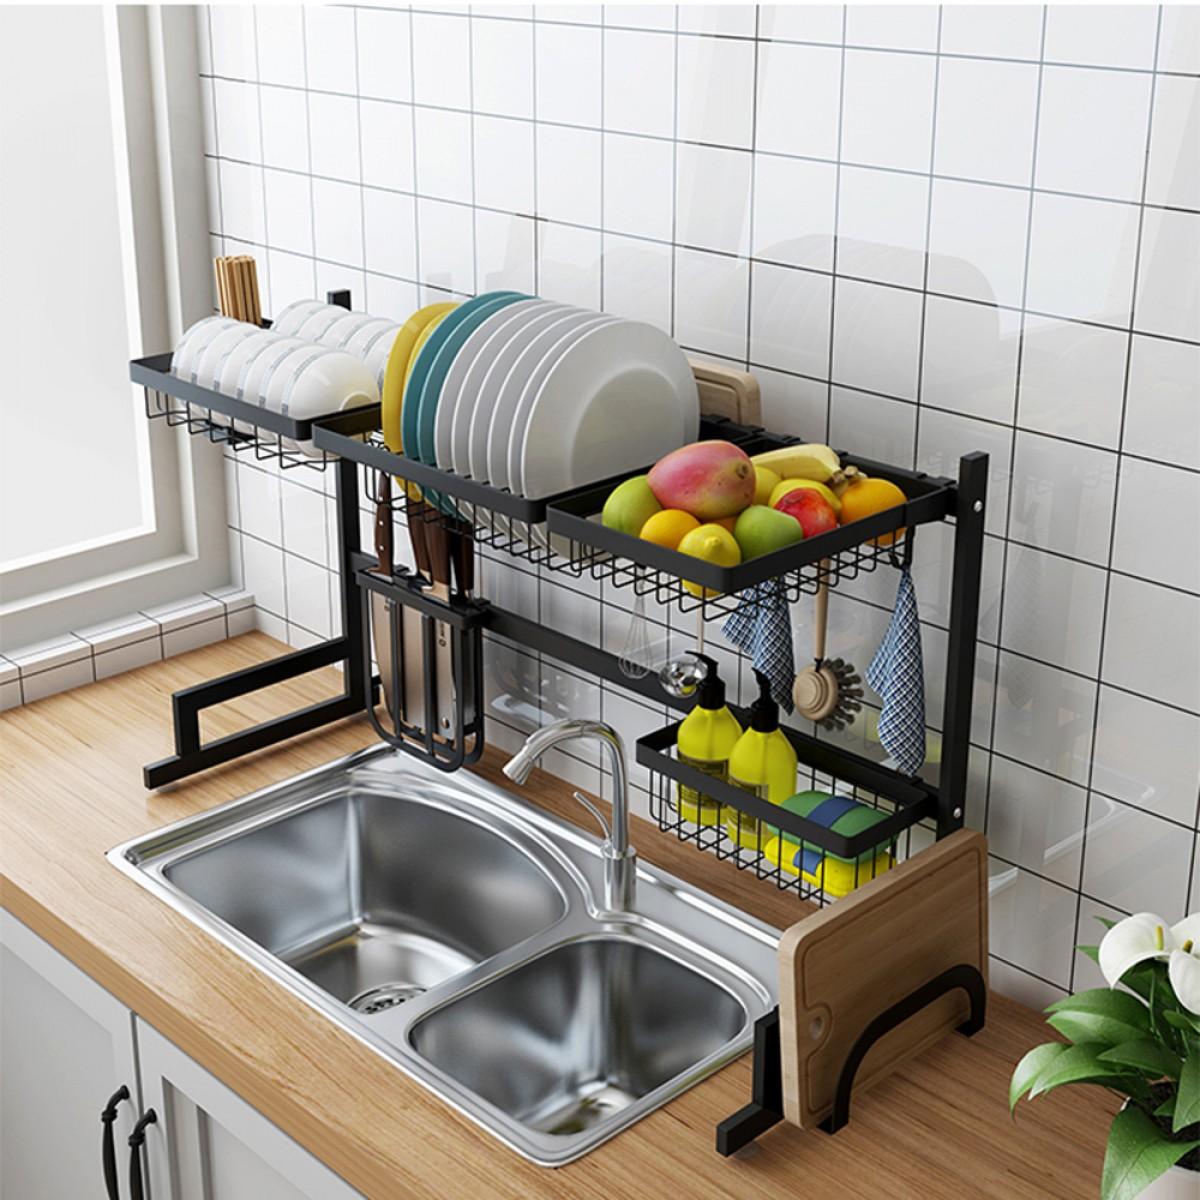 34 6 stainless steel black dish drying rack over kitchen sink dishes and utensils draining shelf kitchen storage countertop organizer utensils